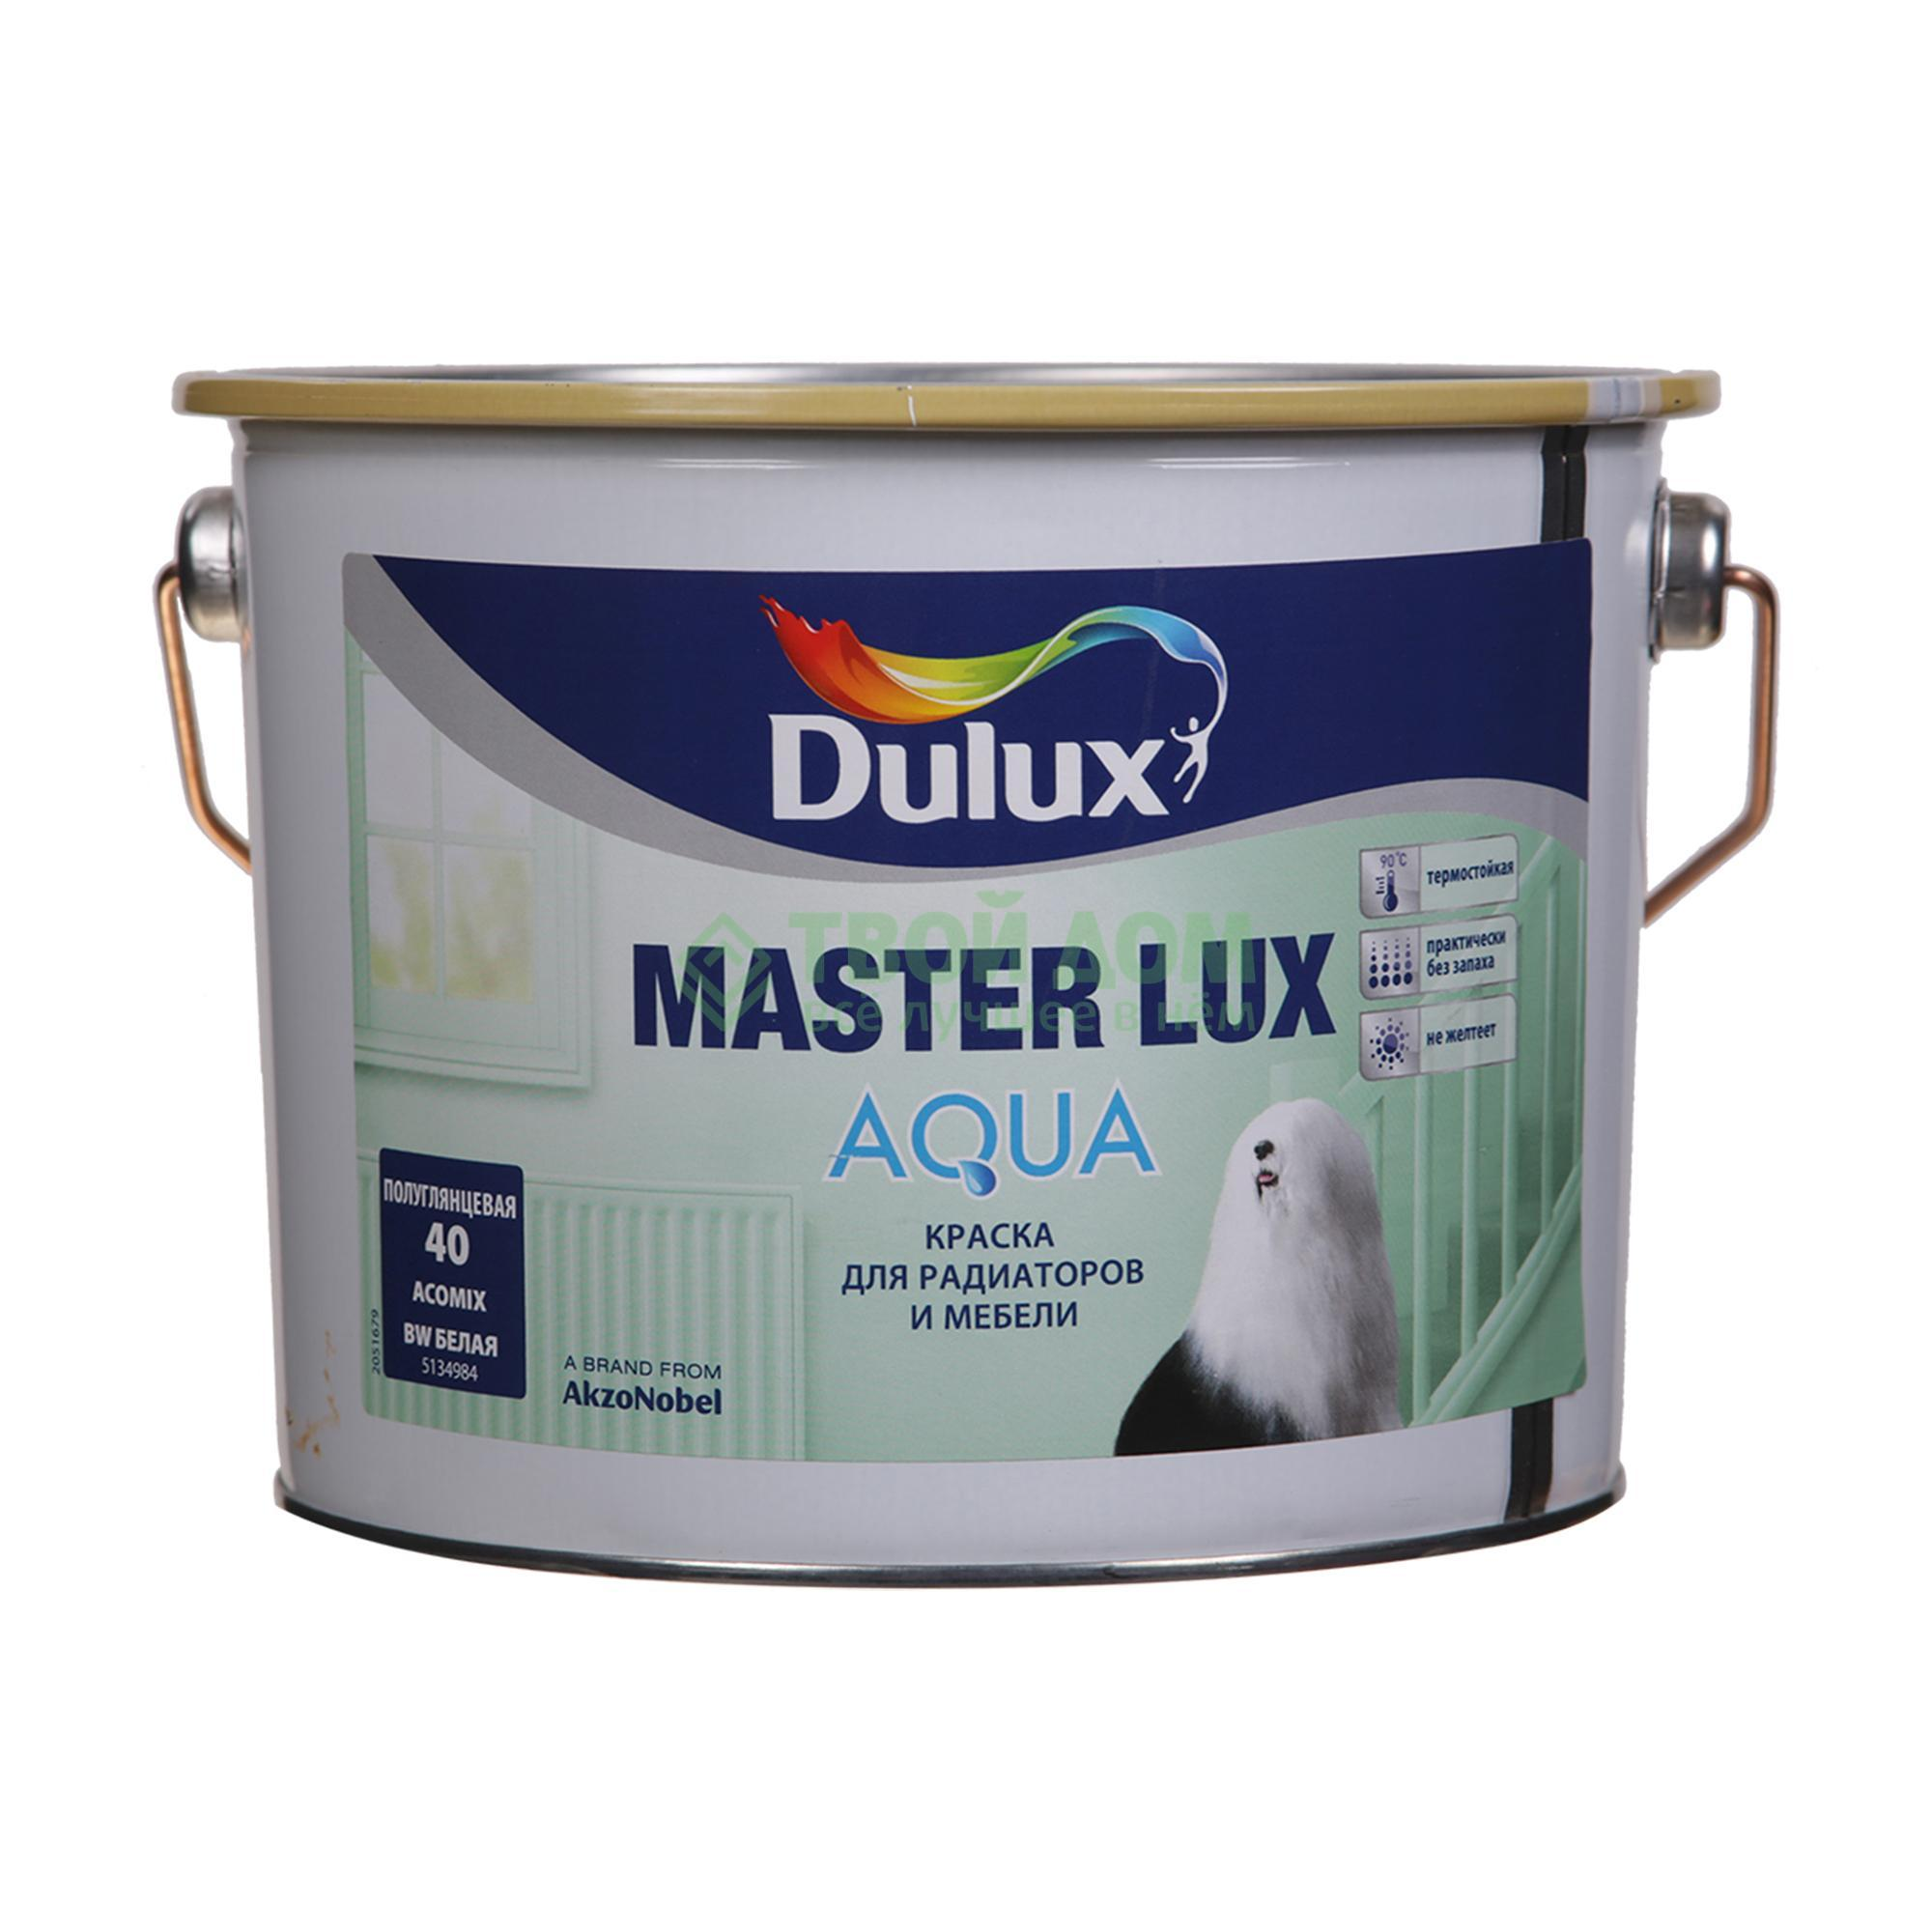 Купить Краска Dulux Master lux aqua 40 bw белая 3л (5134984), краска, Нидерланды, белый